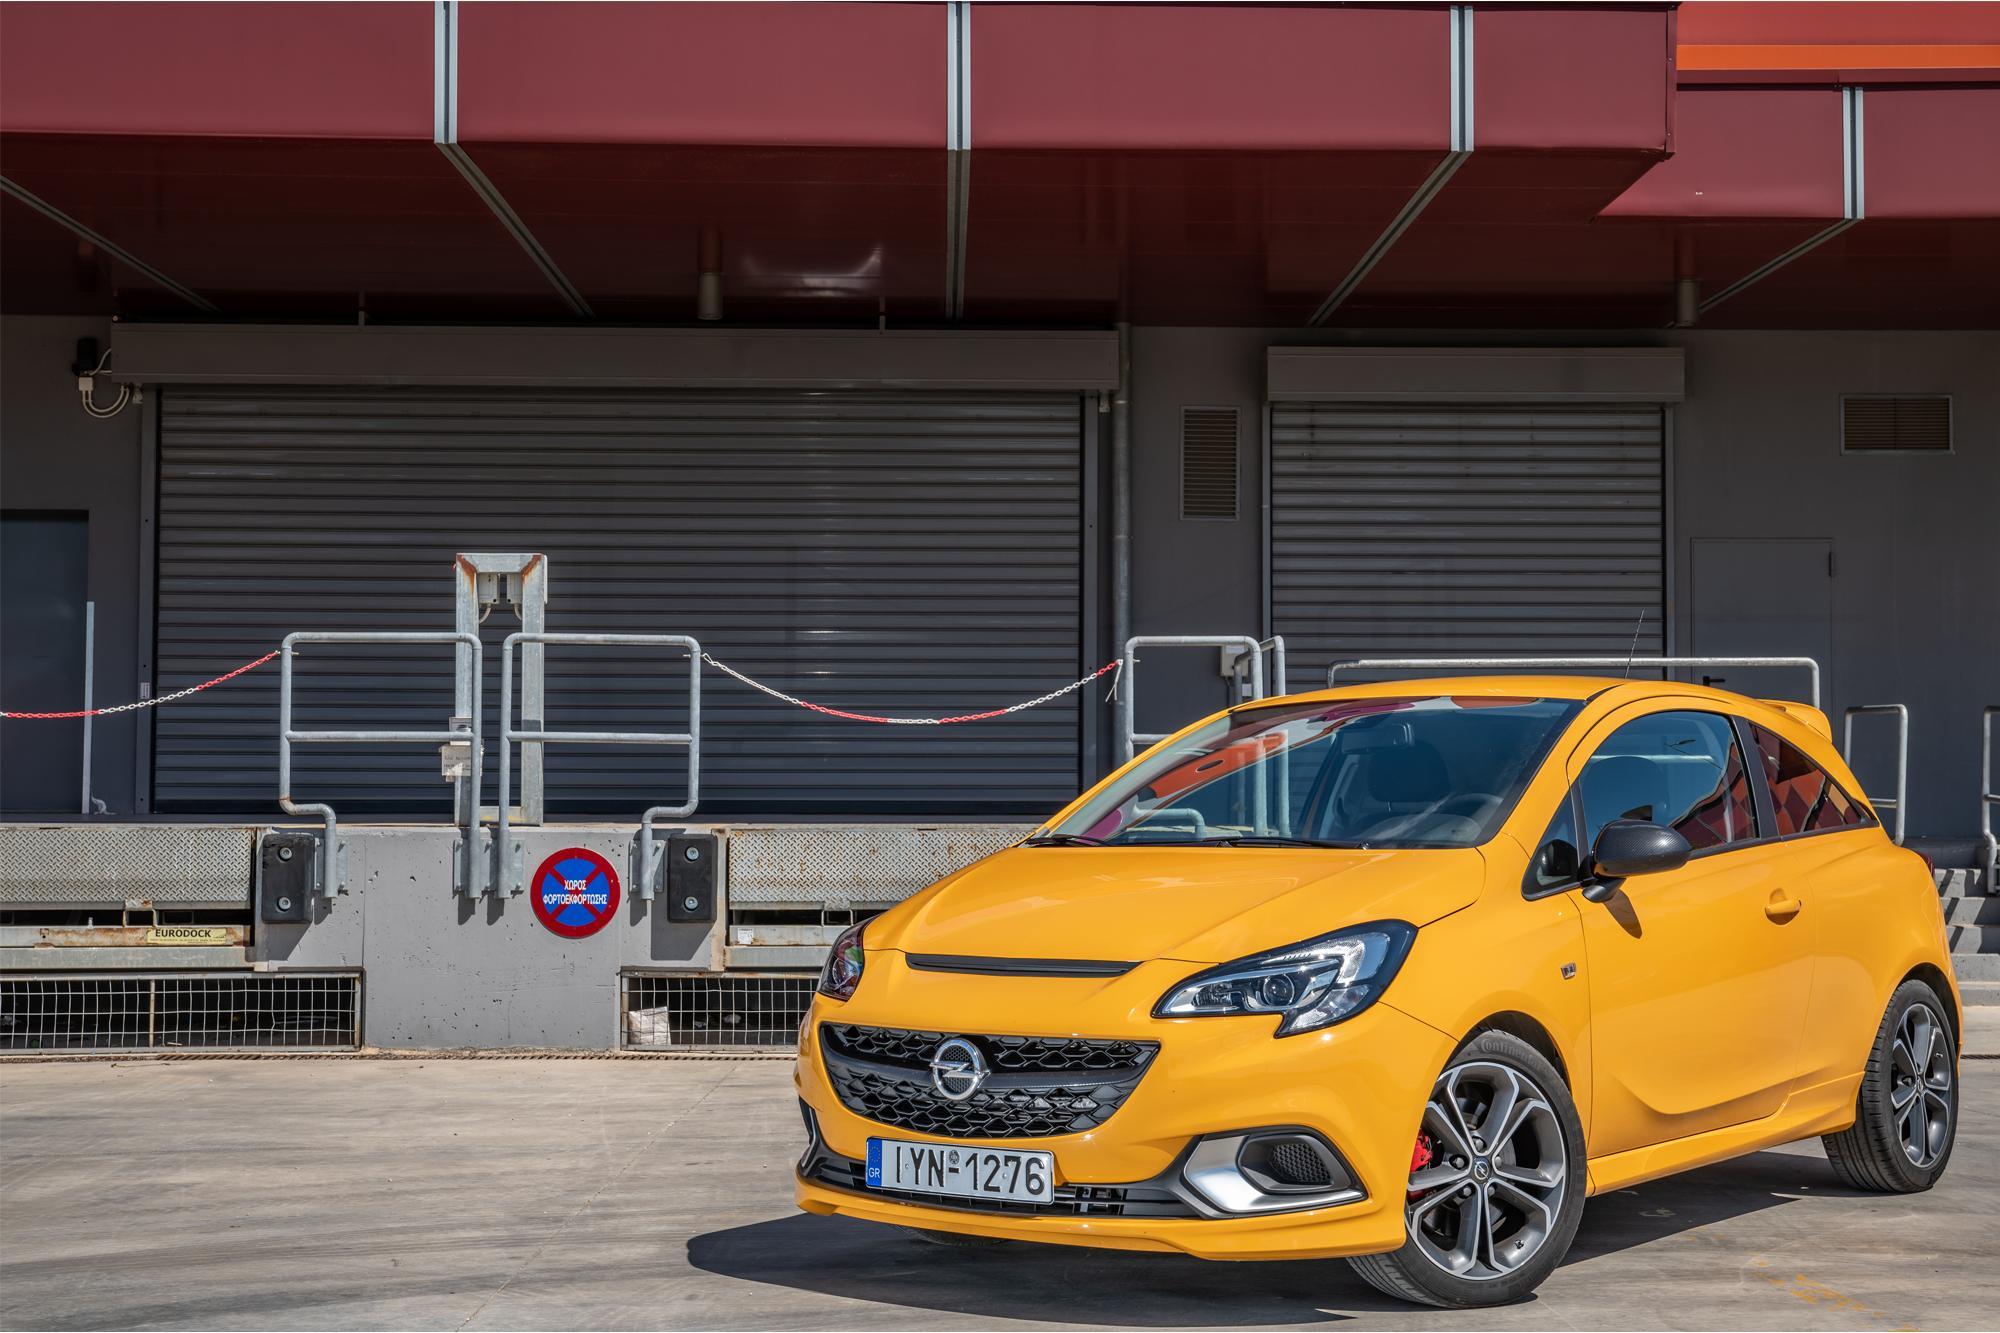 Opel Corsa GSi 1.4T 150Ps